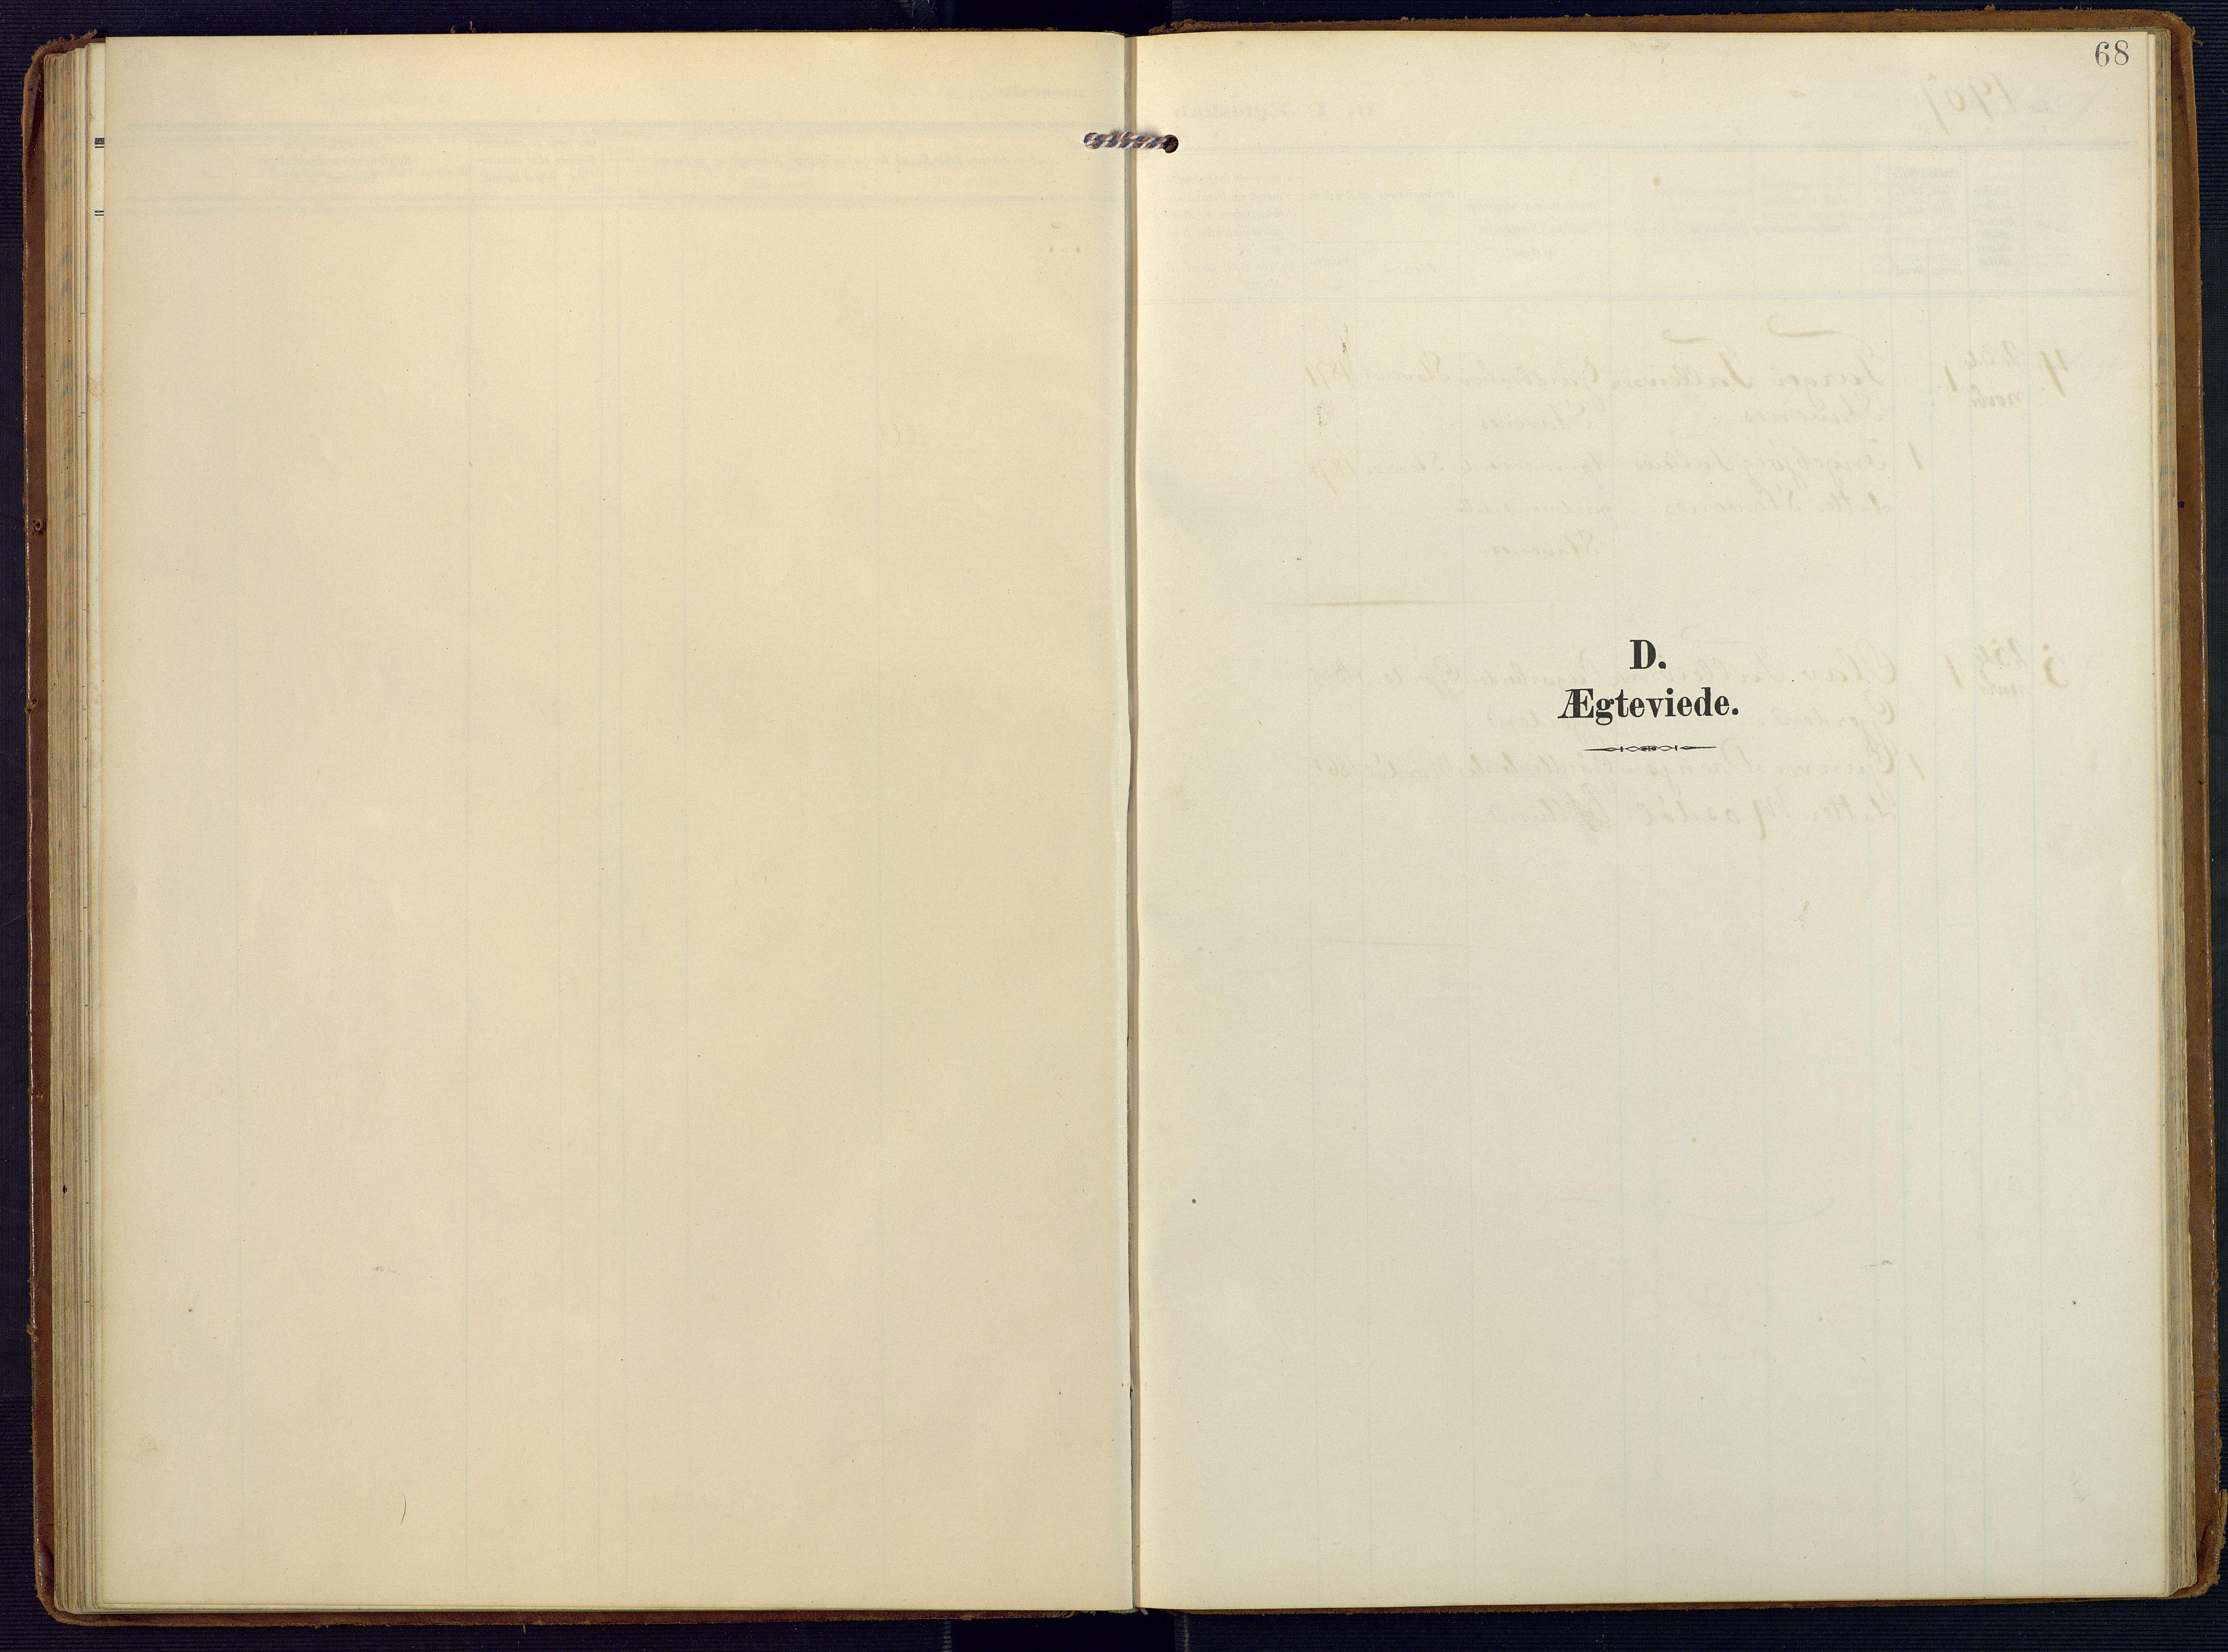 SAK, Valle sokneprestkontor, F/Fa/Faa/L0002: Ministerialbok nr. A 2, 1907-1919, s. 68